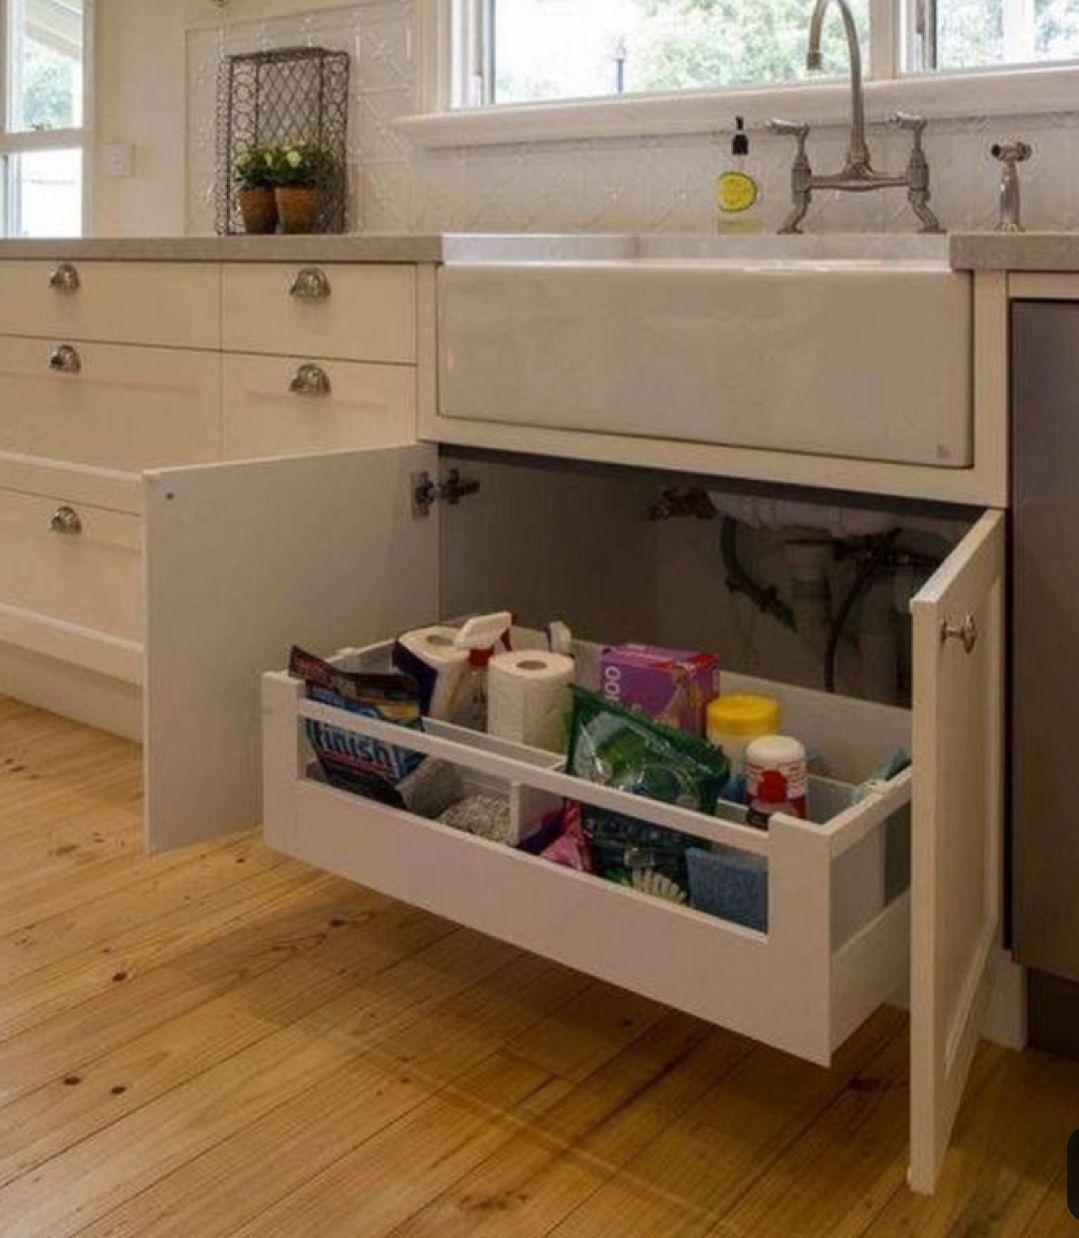 Pull Out Drawer Under Sink Farmhouse Cabinets Kitchen Cabinet Styles Under Kitchen Sinks